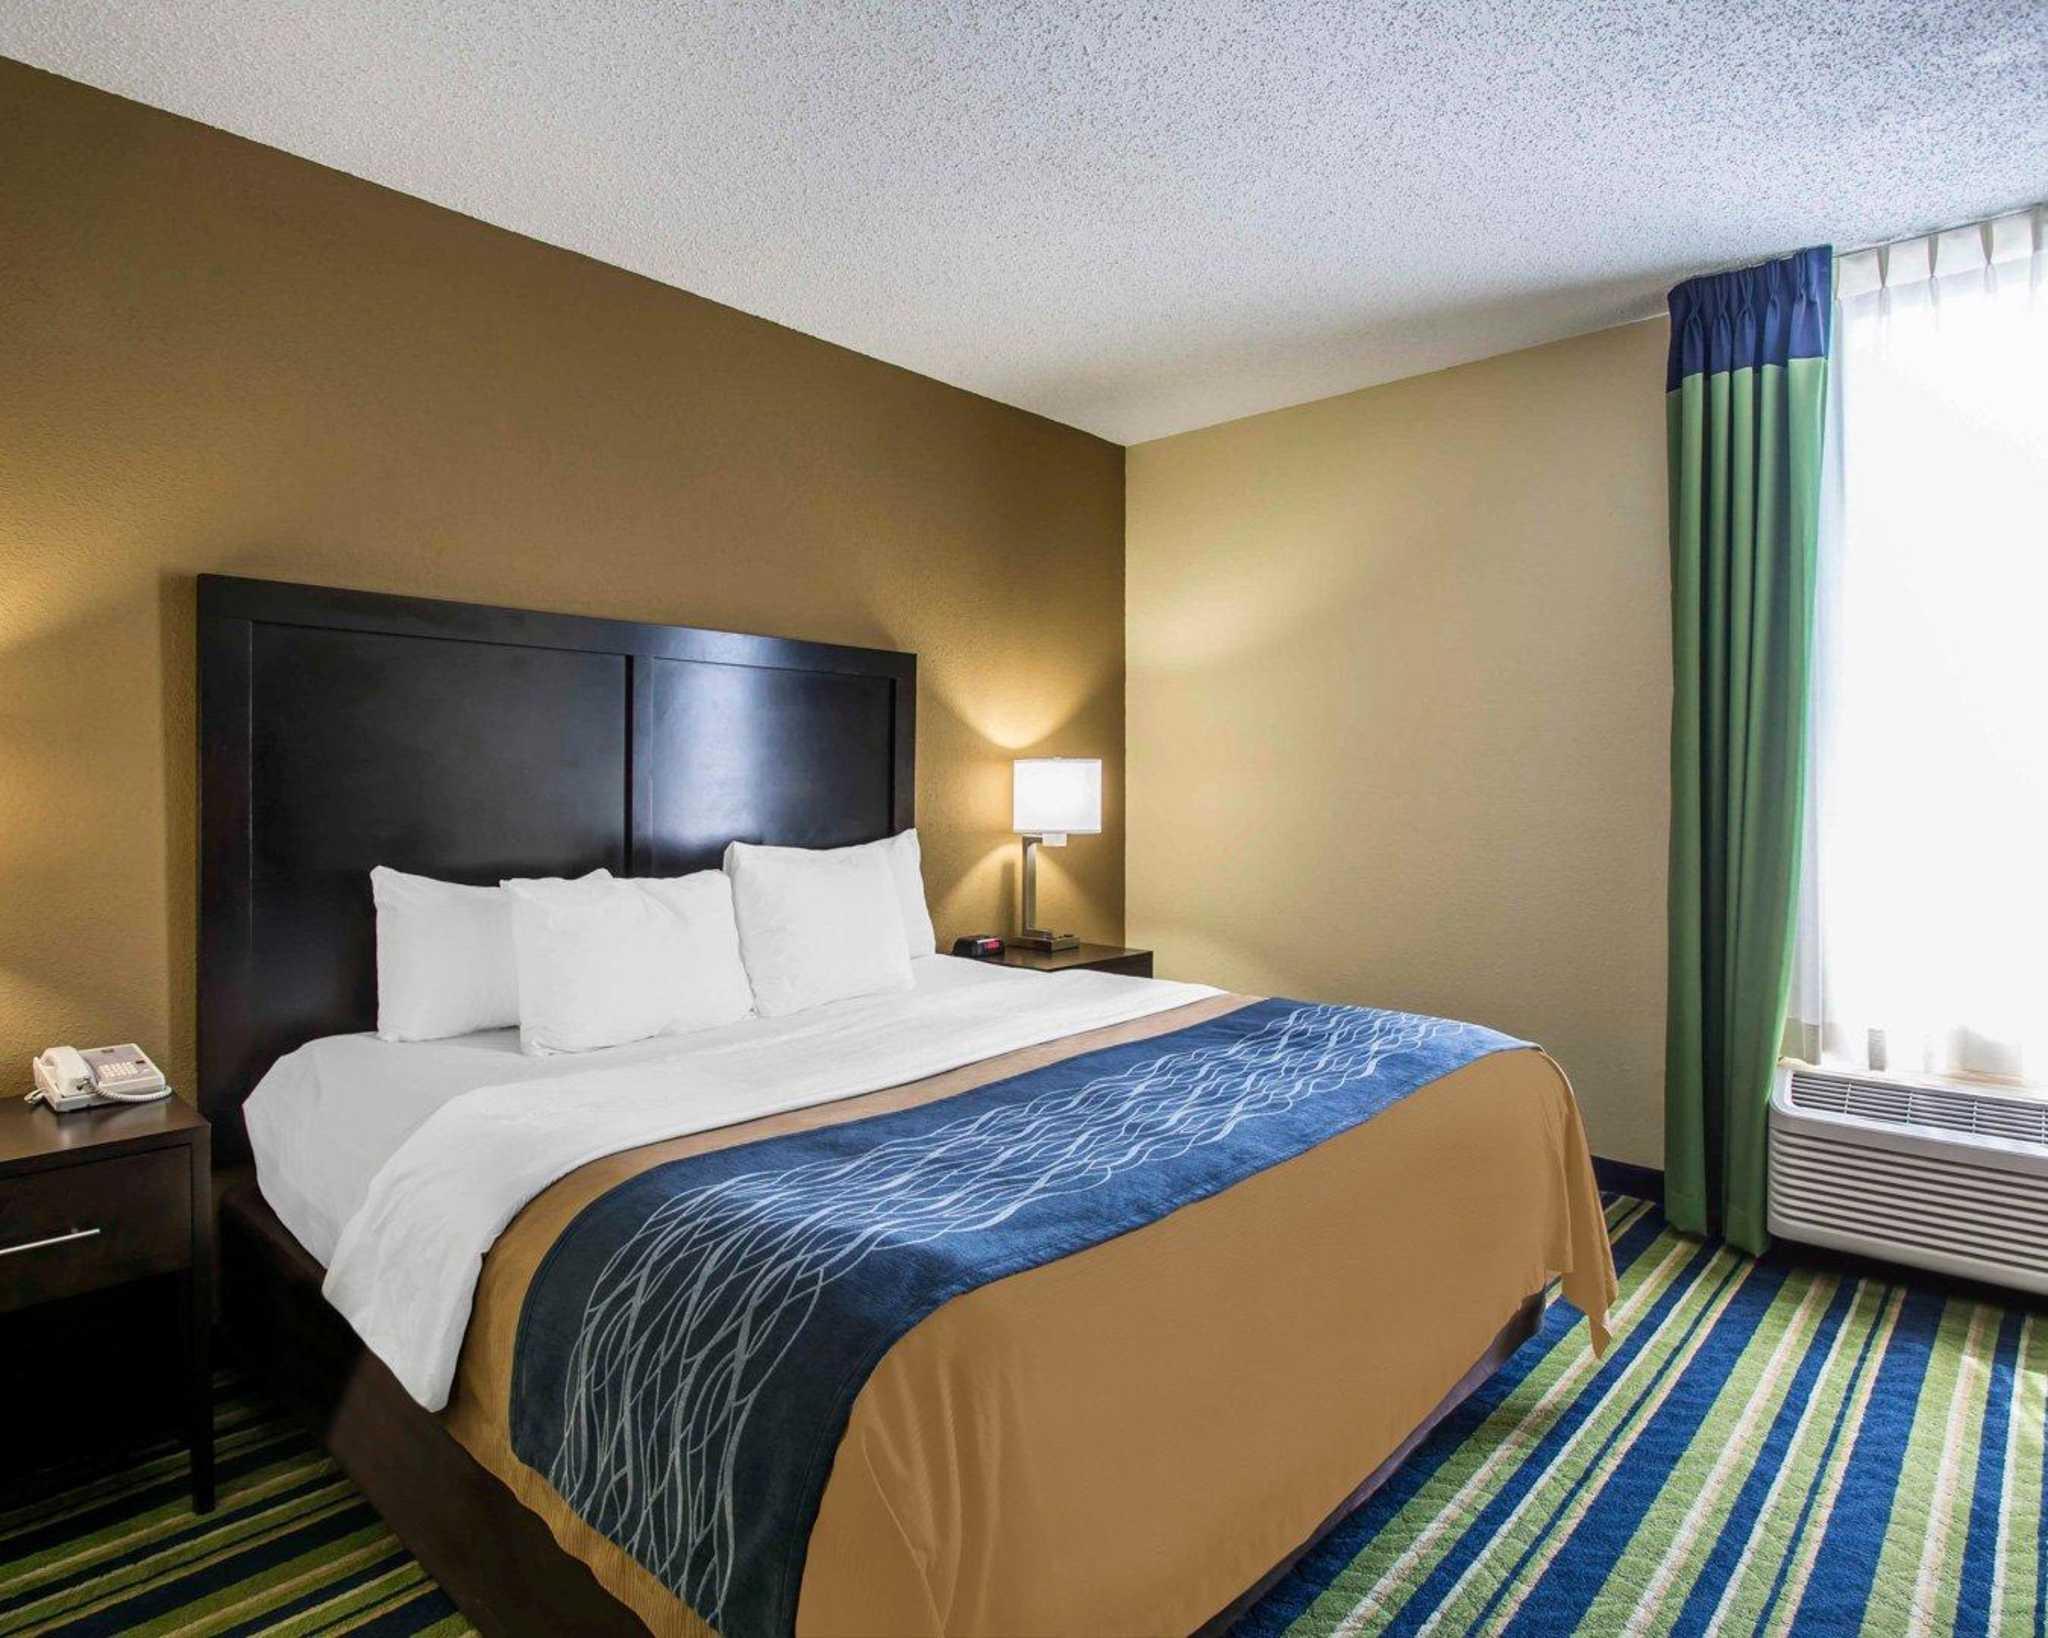 Comfort Inn & Suites Lantana - West Palm Beach South image 19